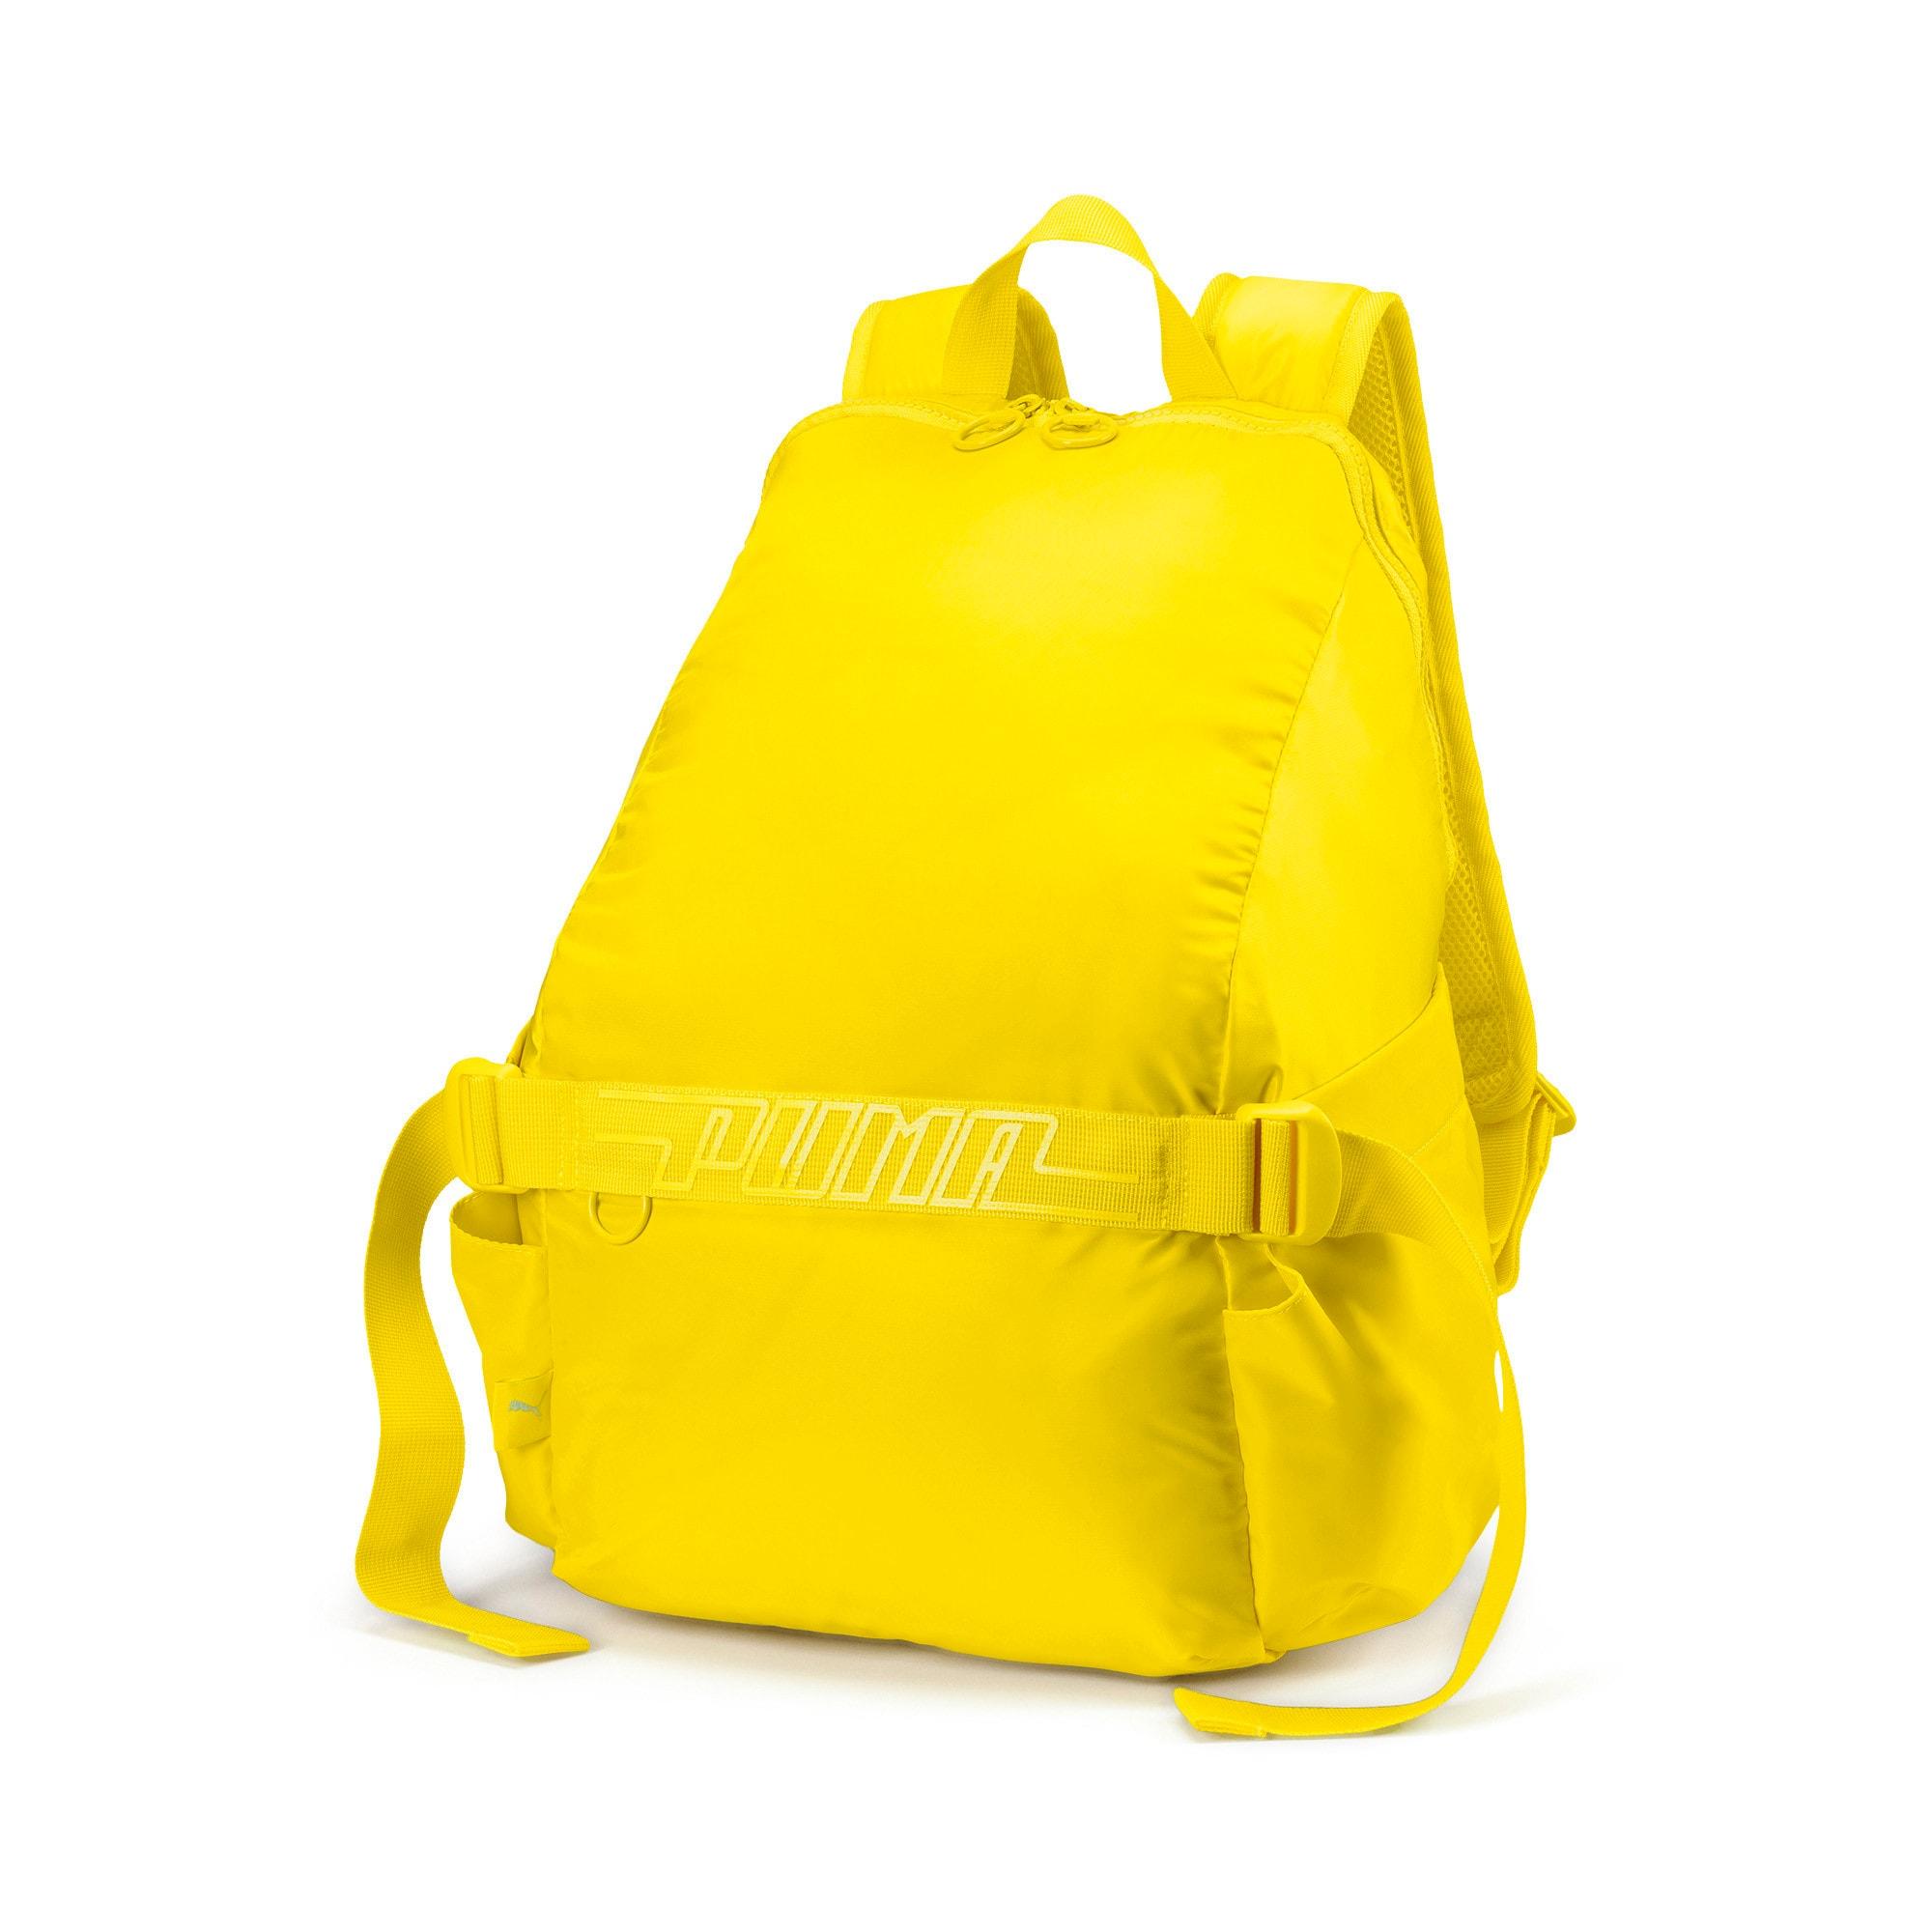 Thumbnail 1 of Cosmic Women's Training Backpack, Blazing Yellow, medium